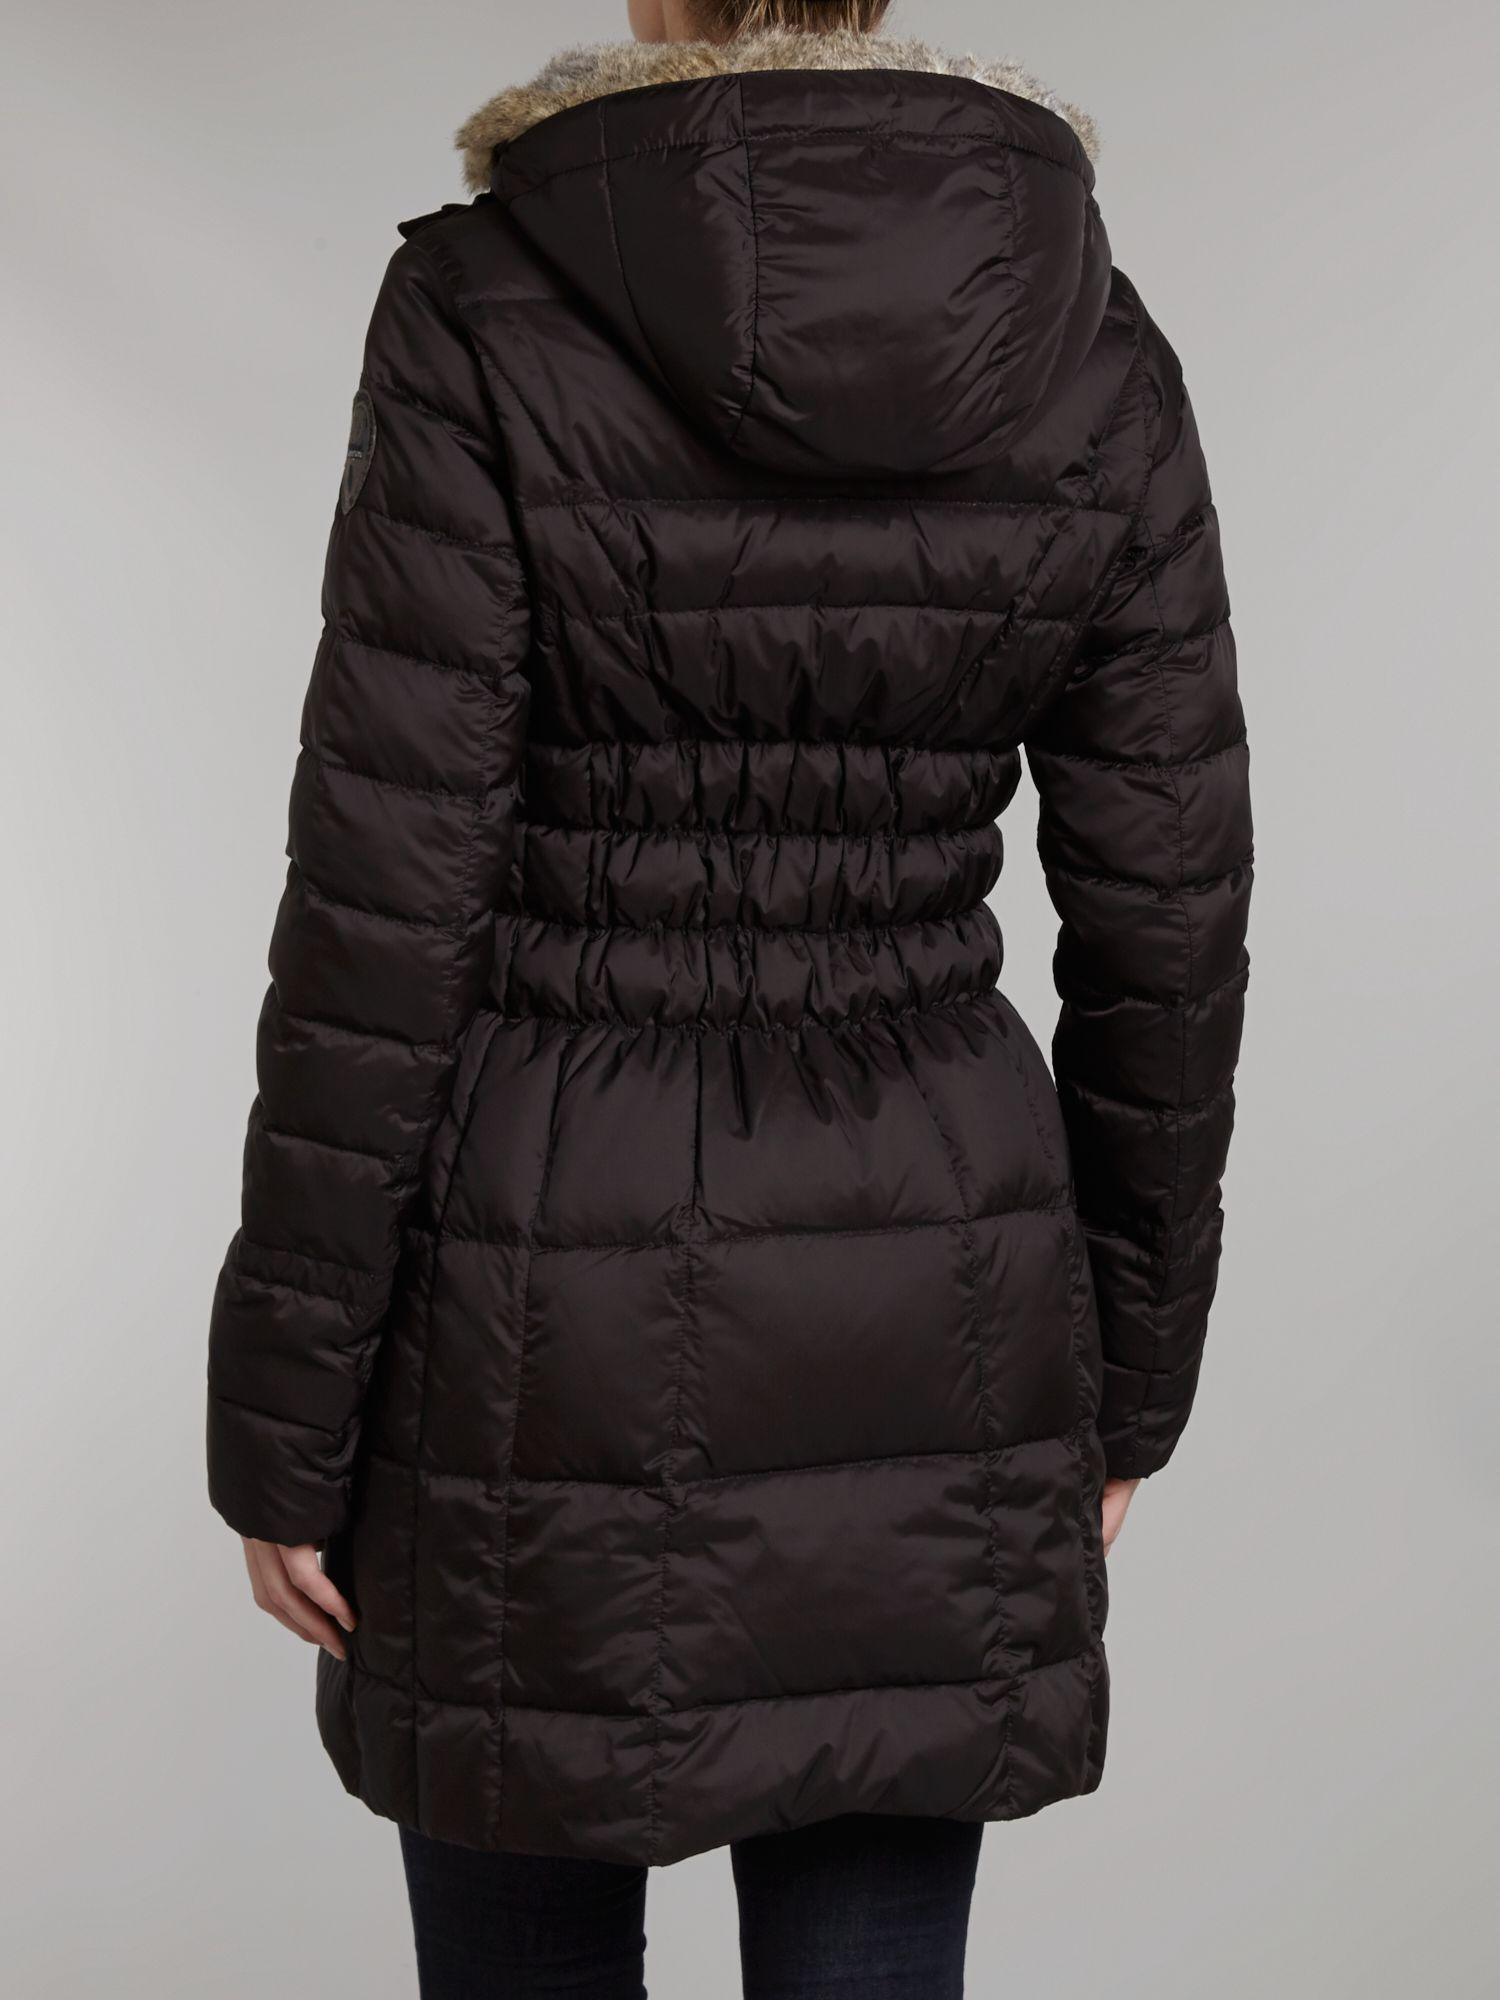 Napapijri Alton Fake Fur Coat In Black Lyst